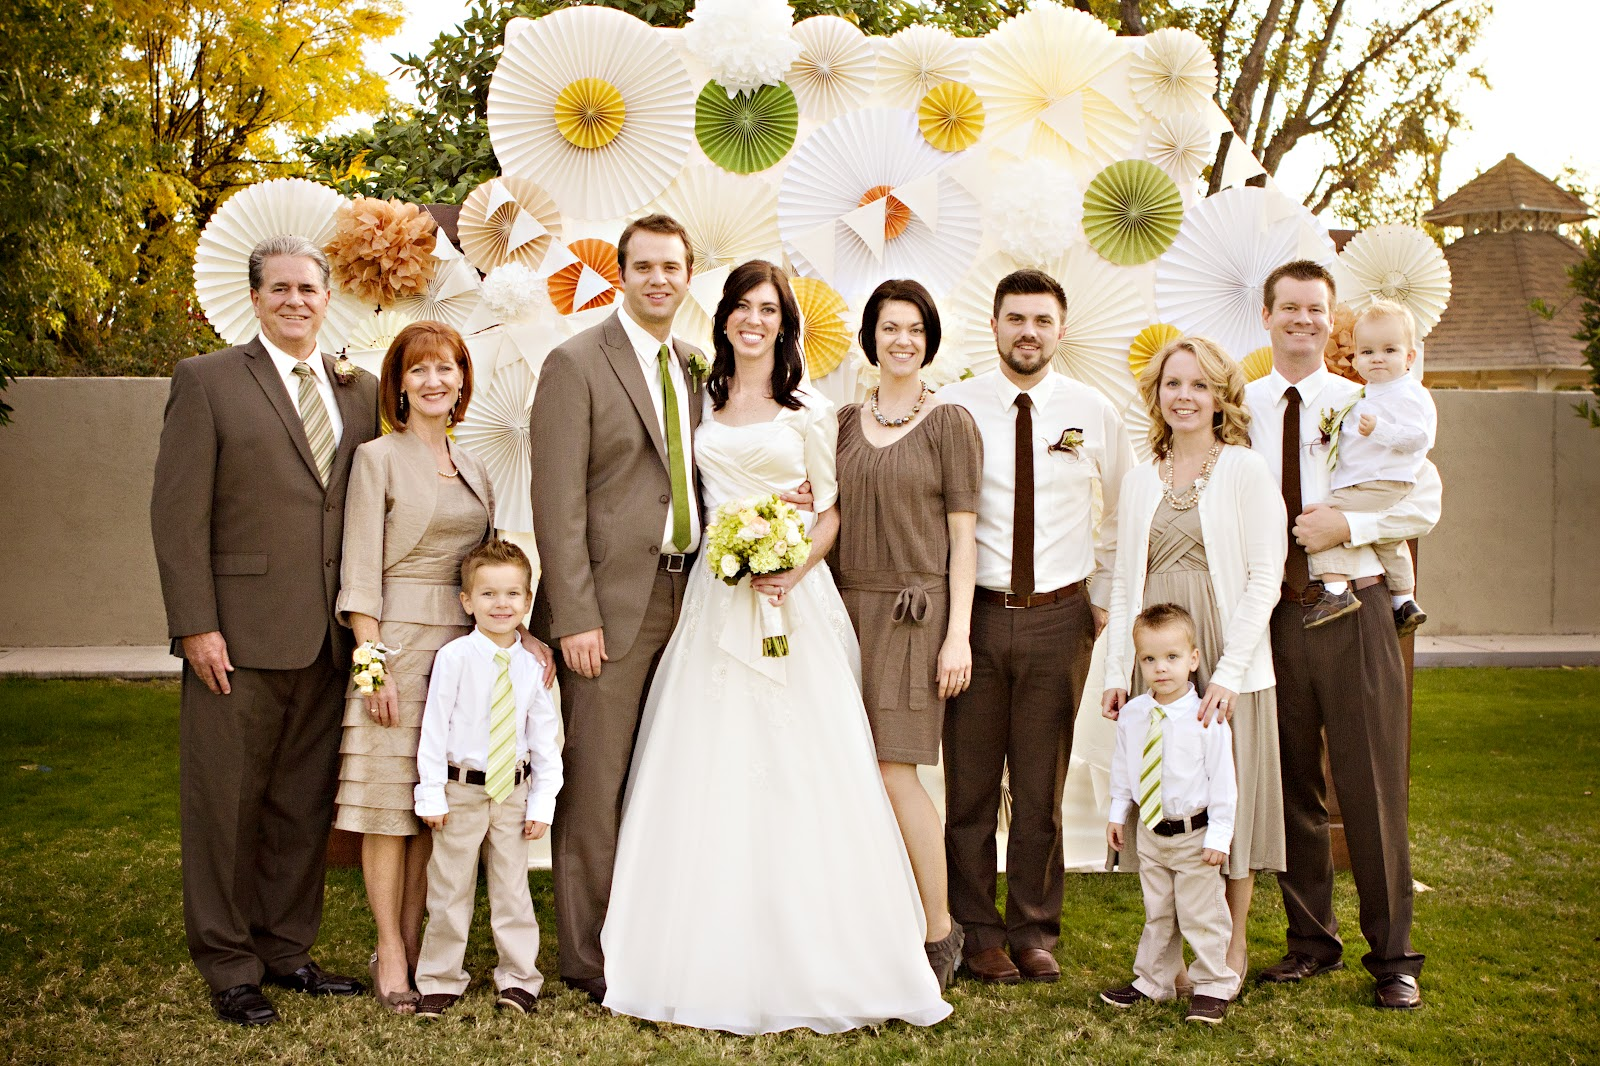 Mattie whipple wedding